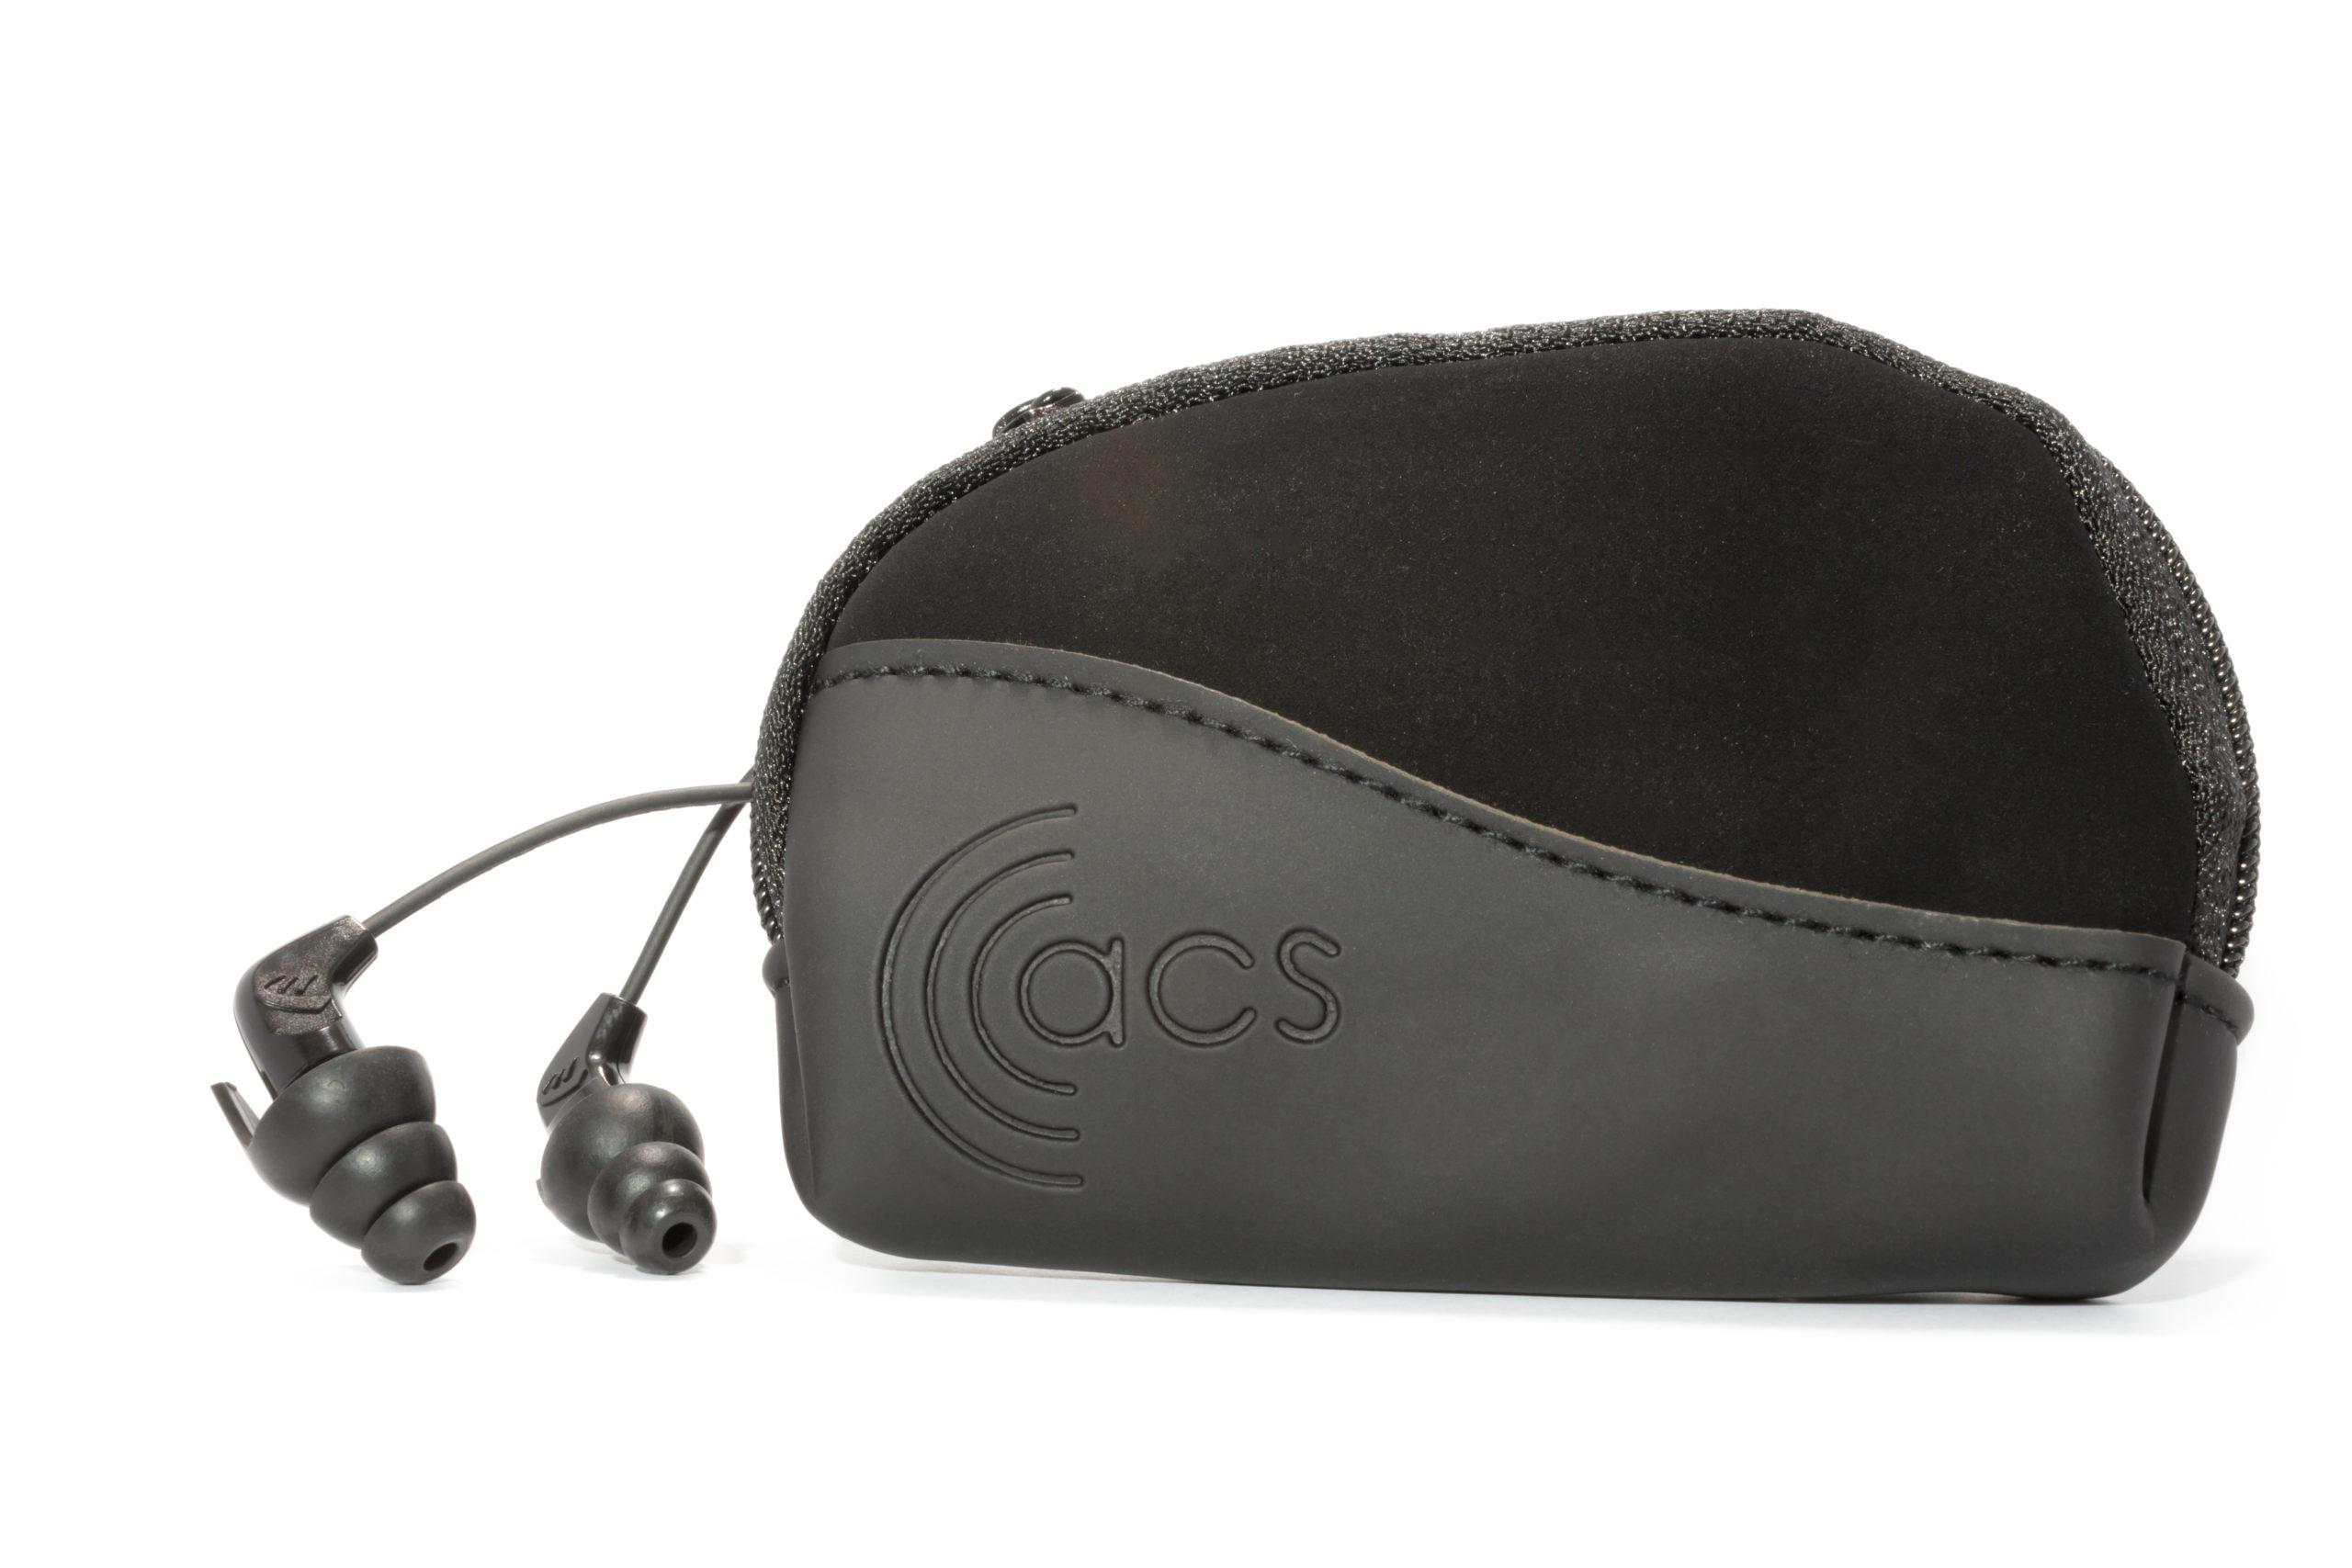 ACS Pro-fit earphones